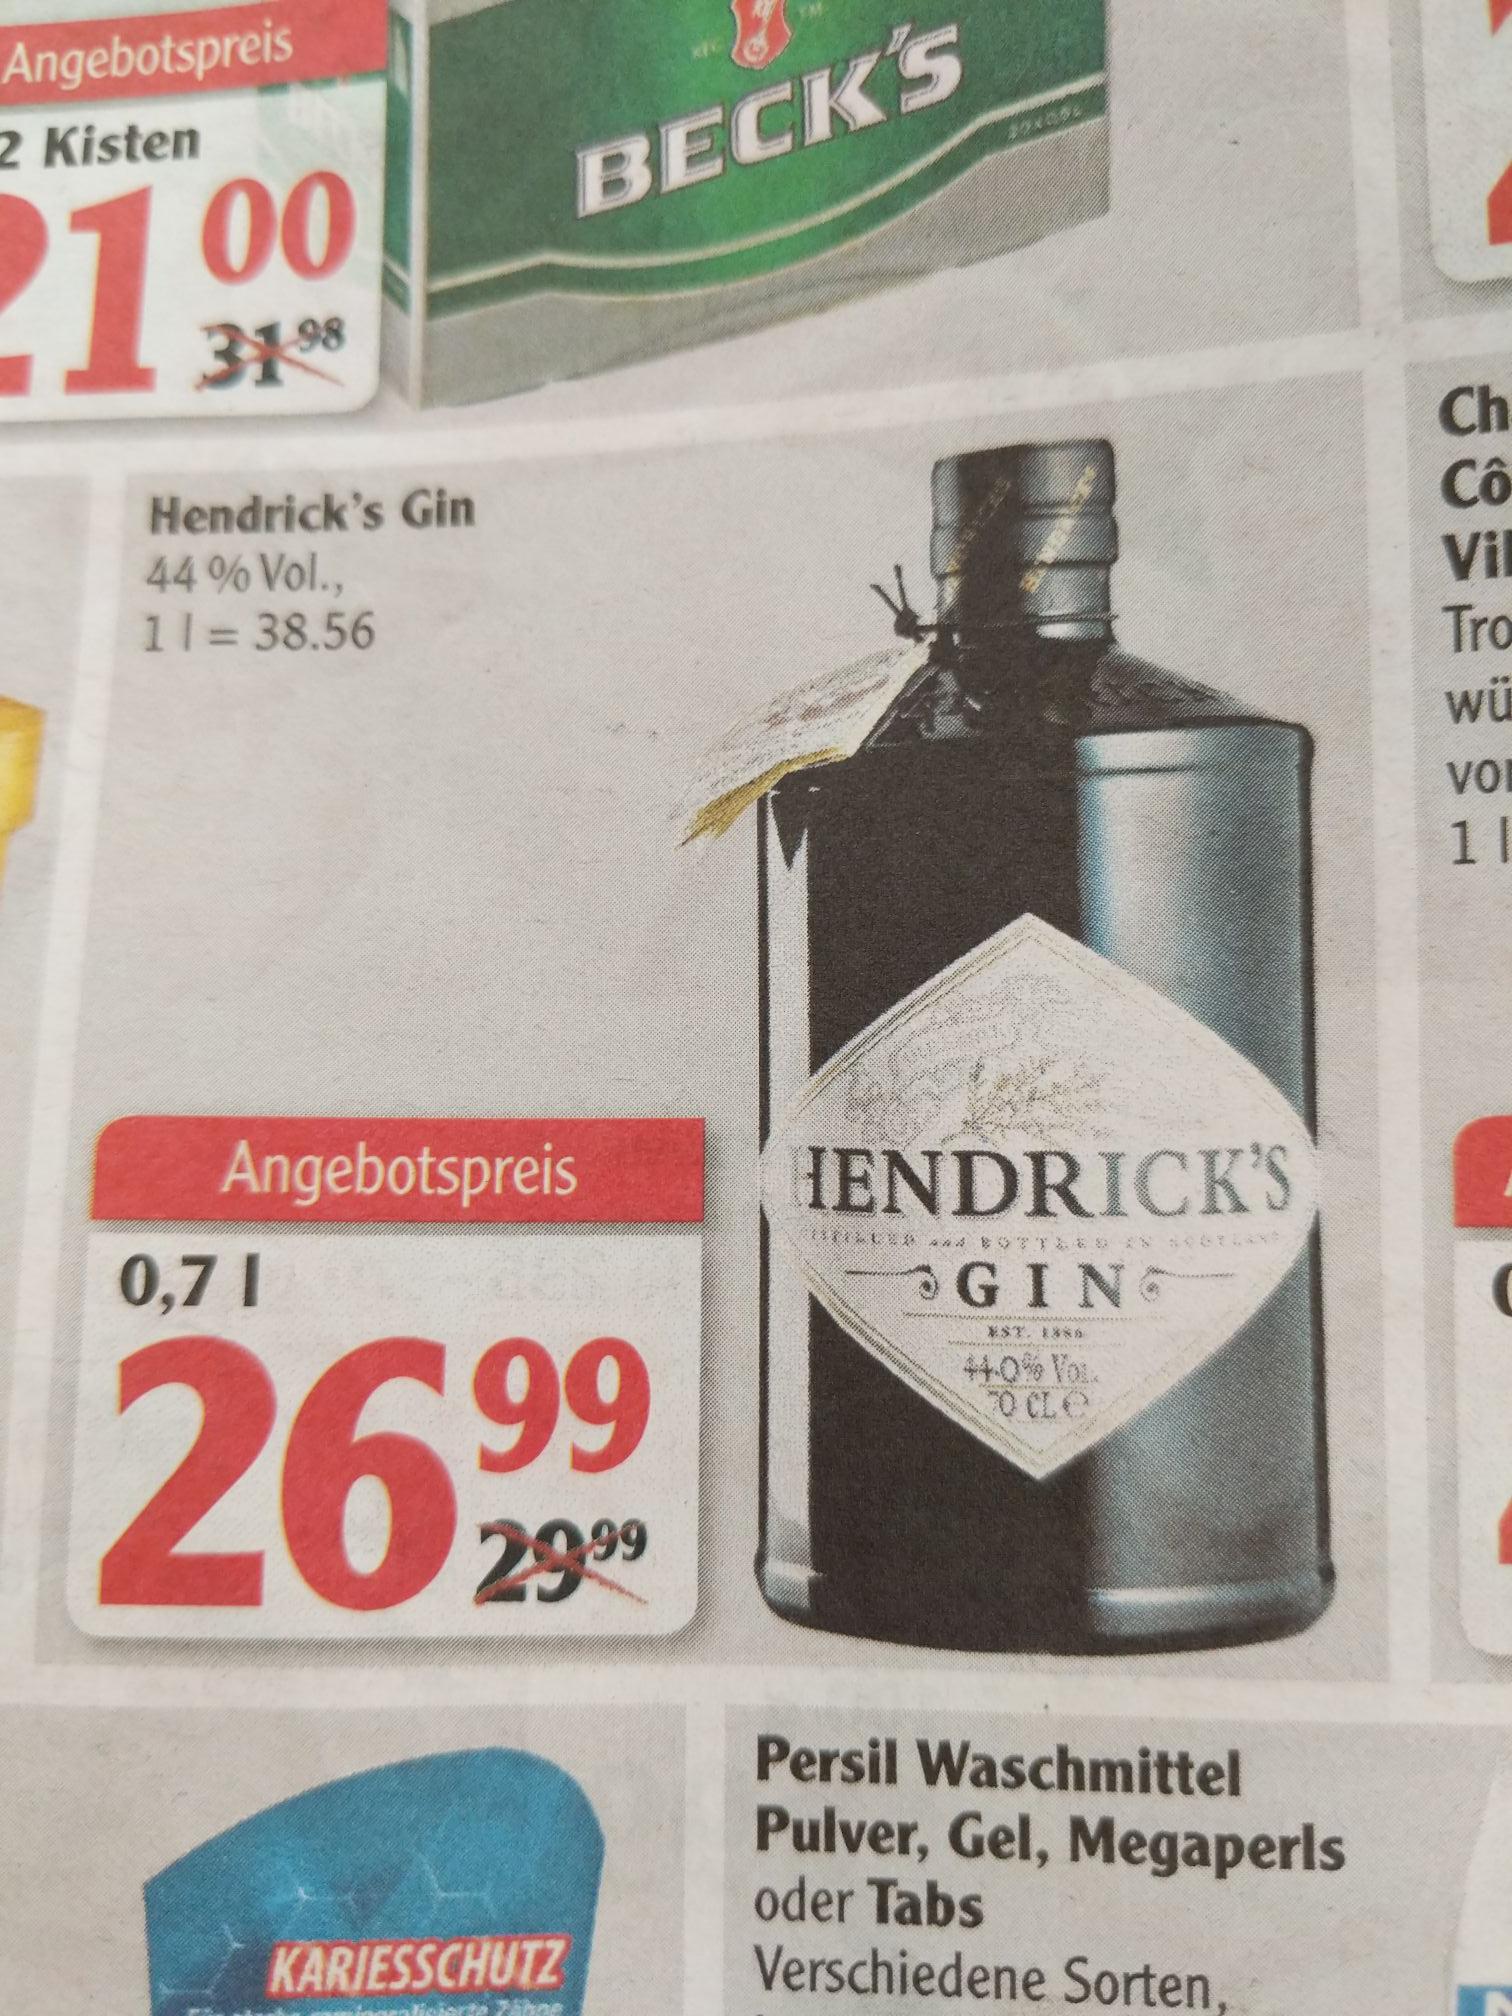 [Globus] Hendricks Gin 0,7 l ab 09.04.18 bis 14.04.18